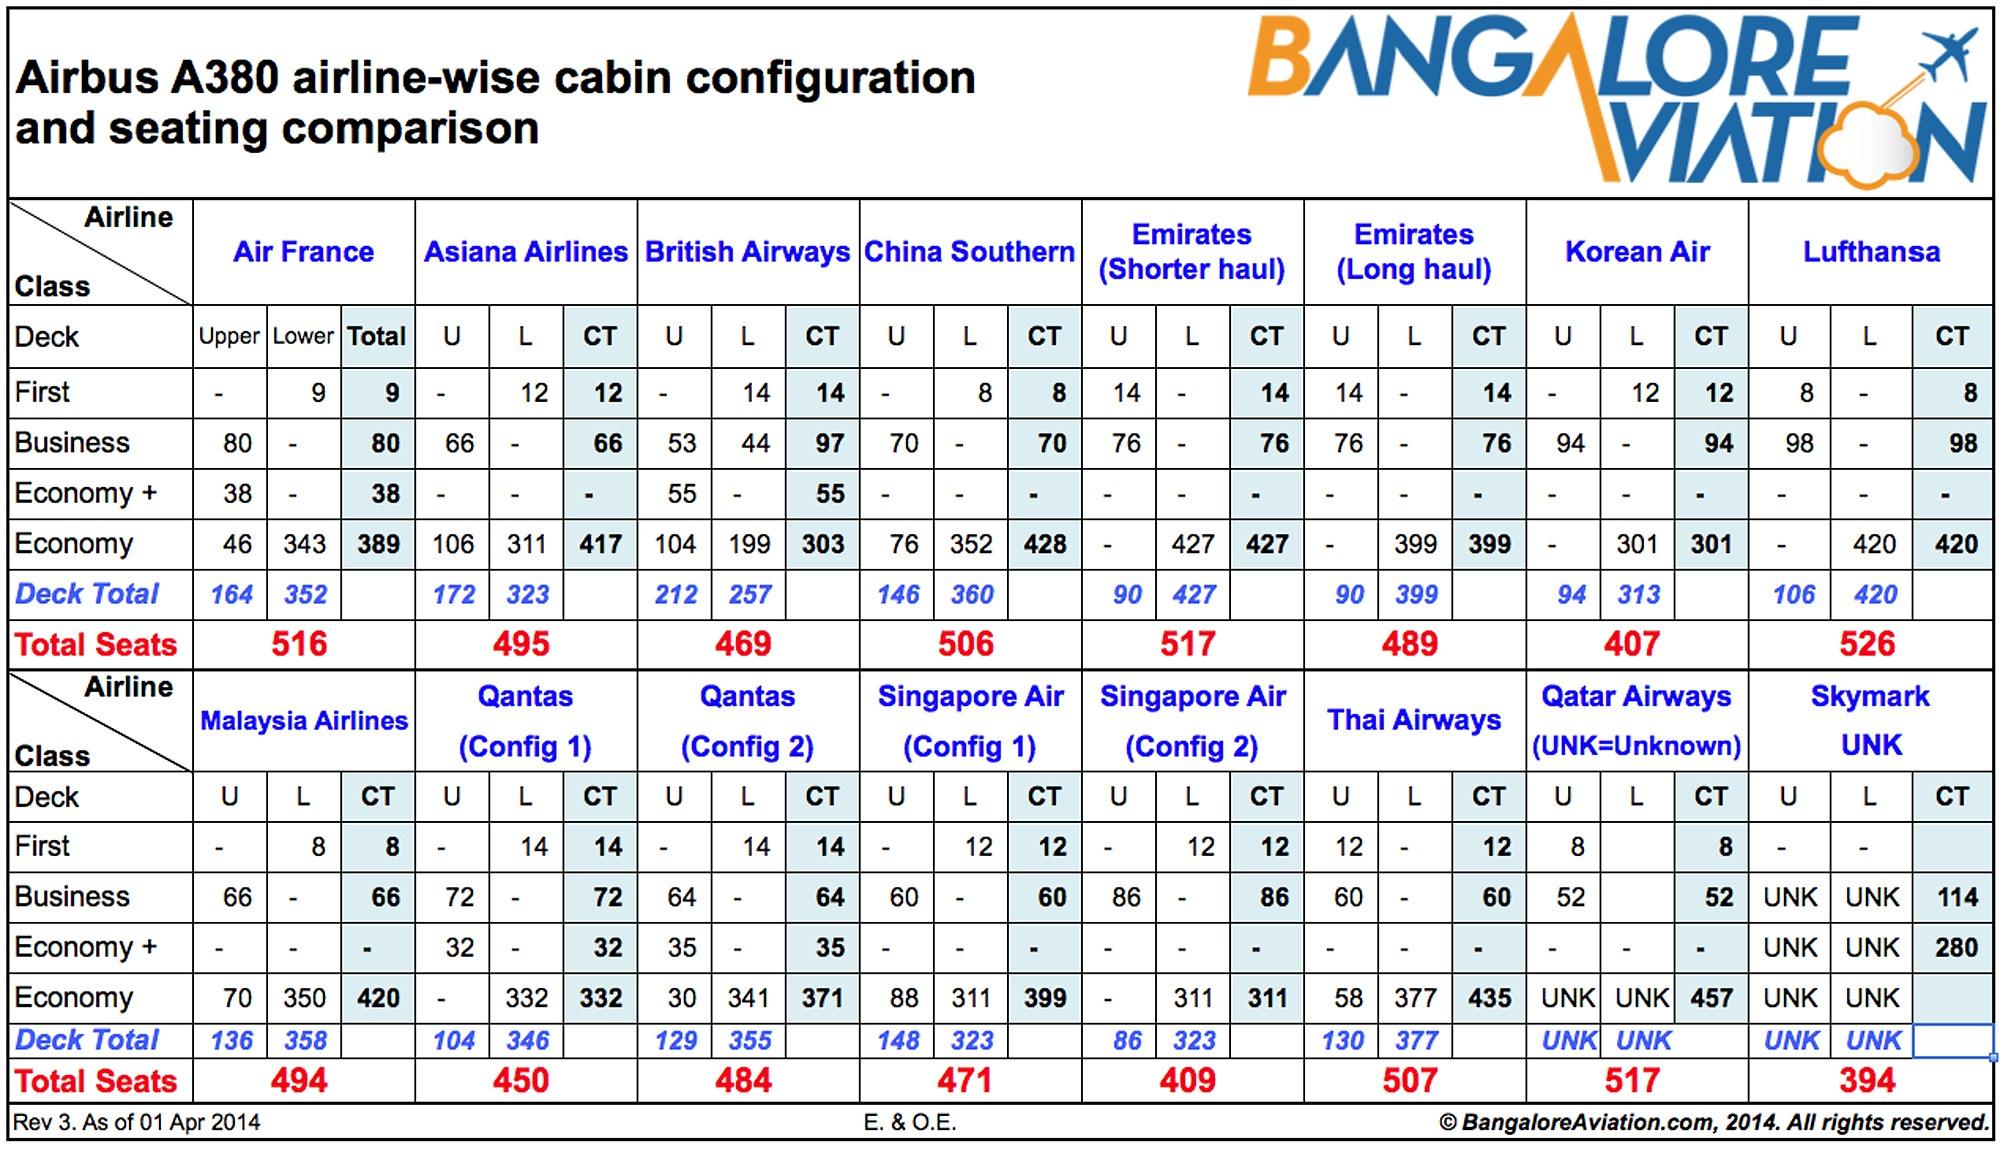 Qantas Airbus A380 Seating Configuration